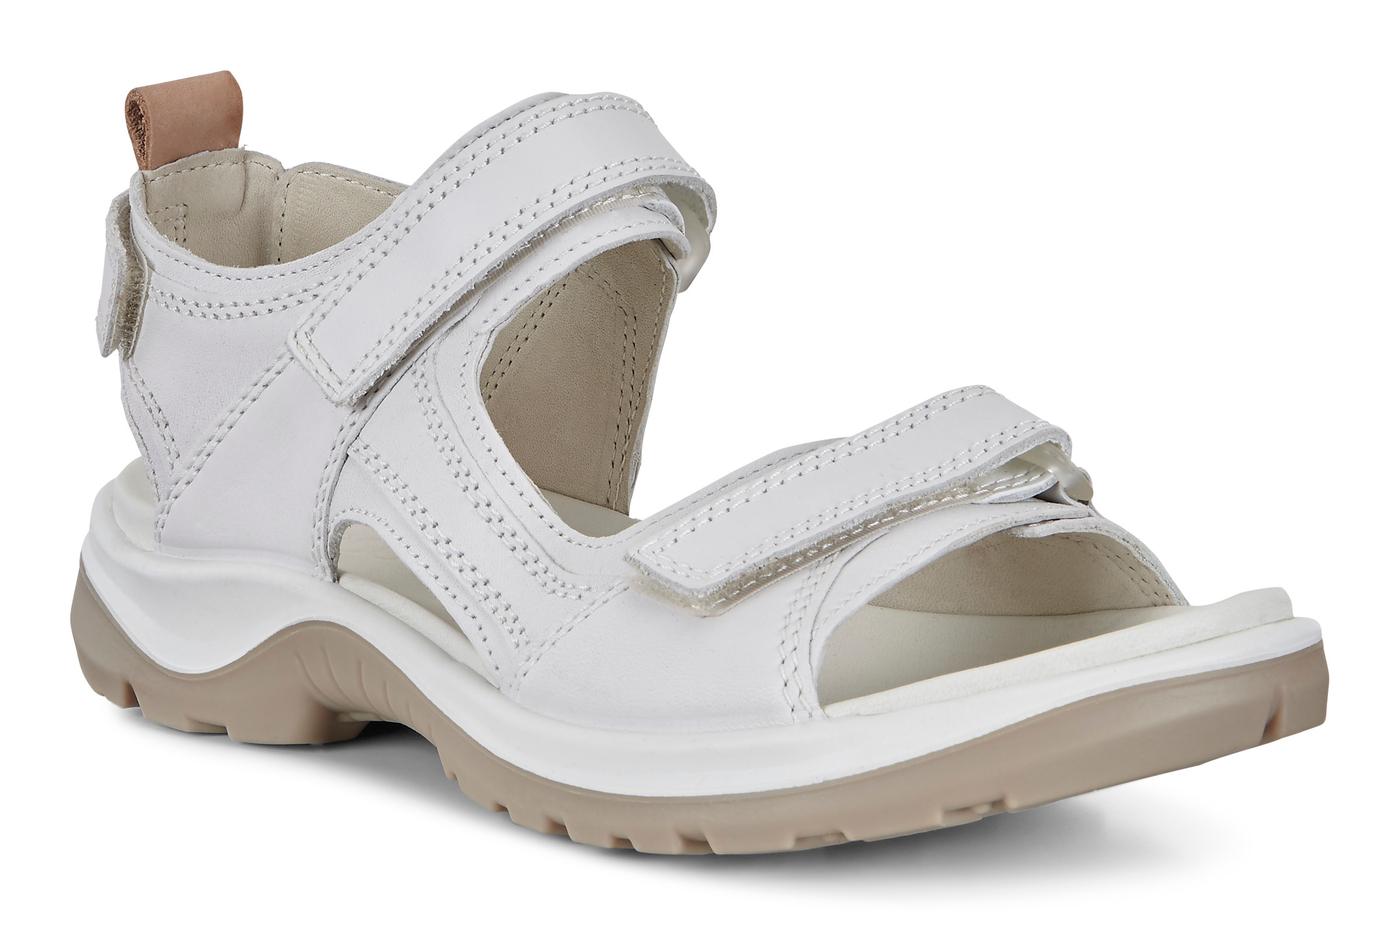 ECCO OFFROAD 2.0 Womens Sandal